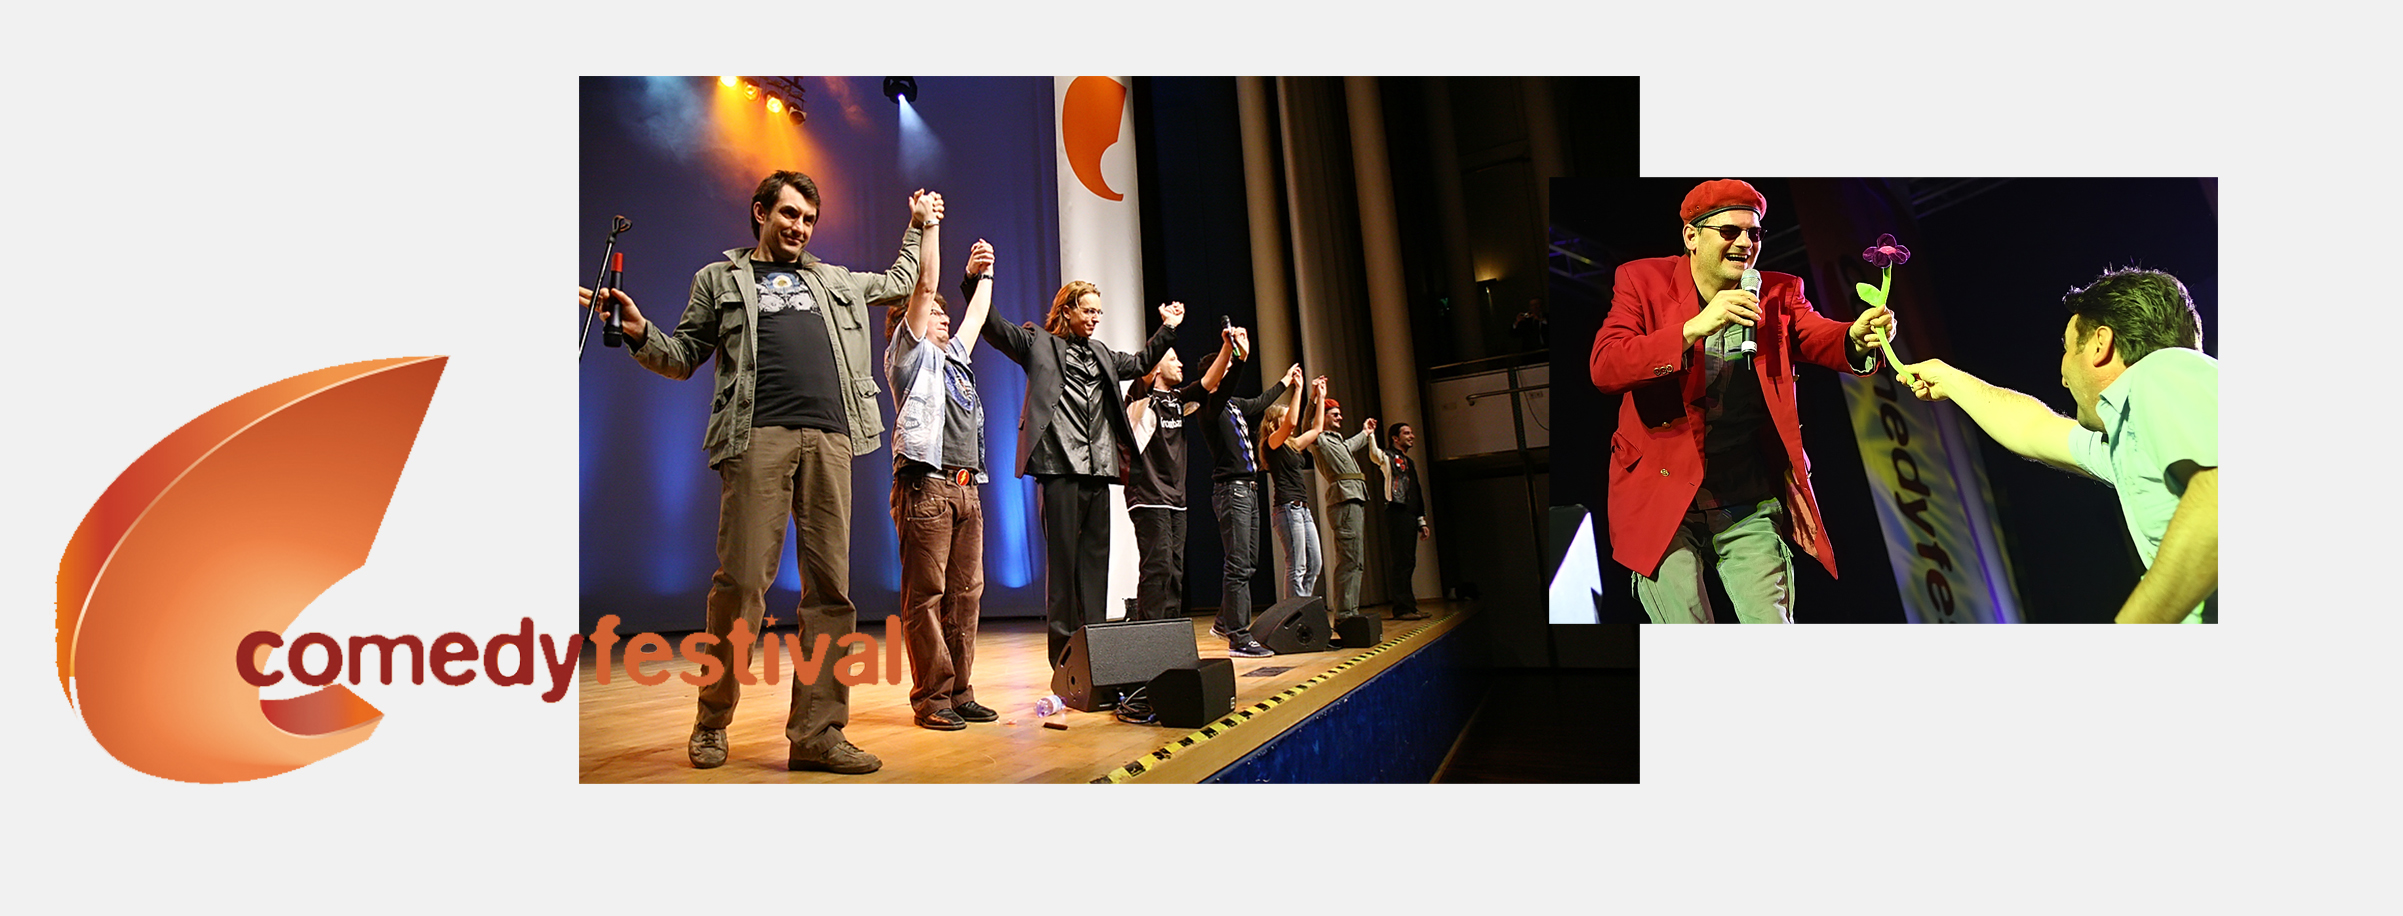 veranstaltung agentur comedyfestival